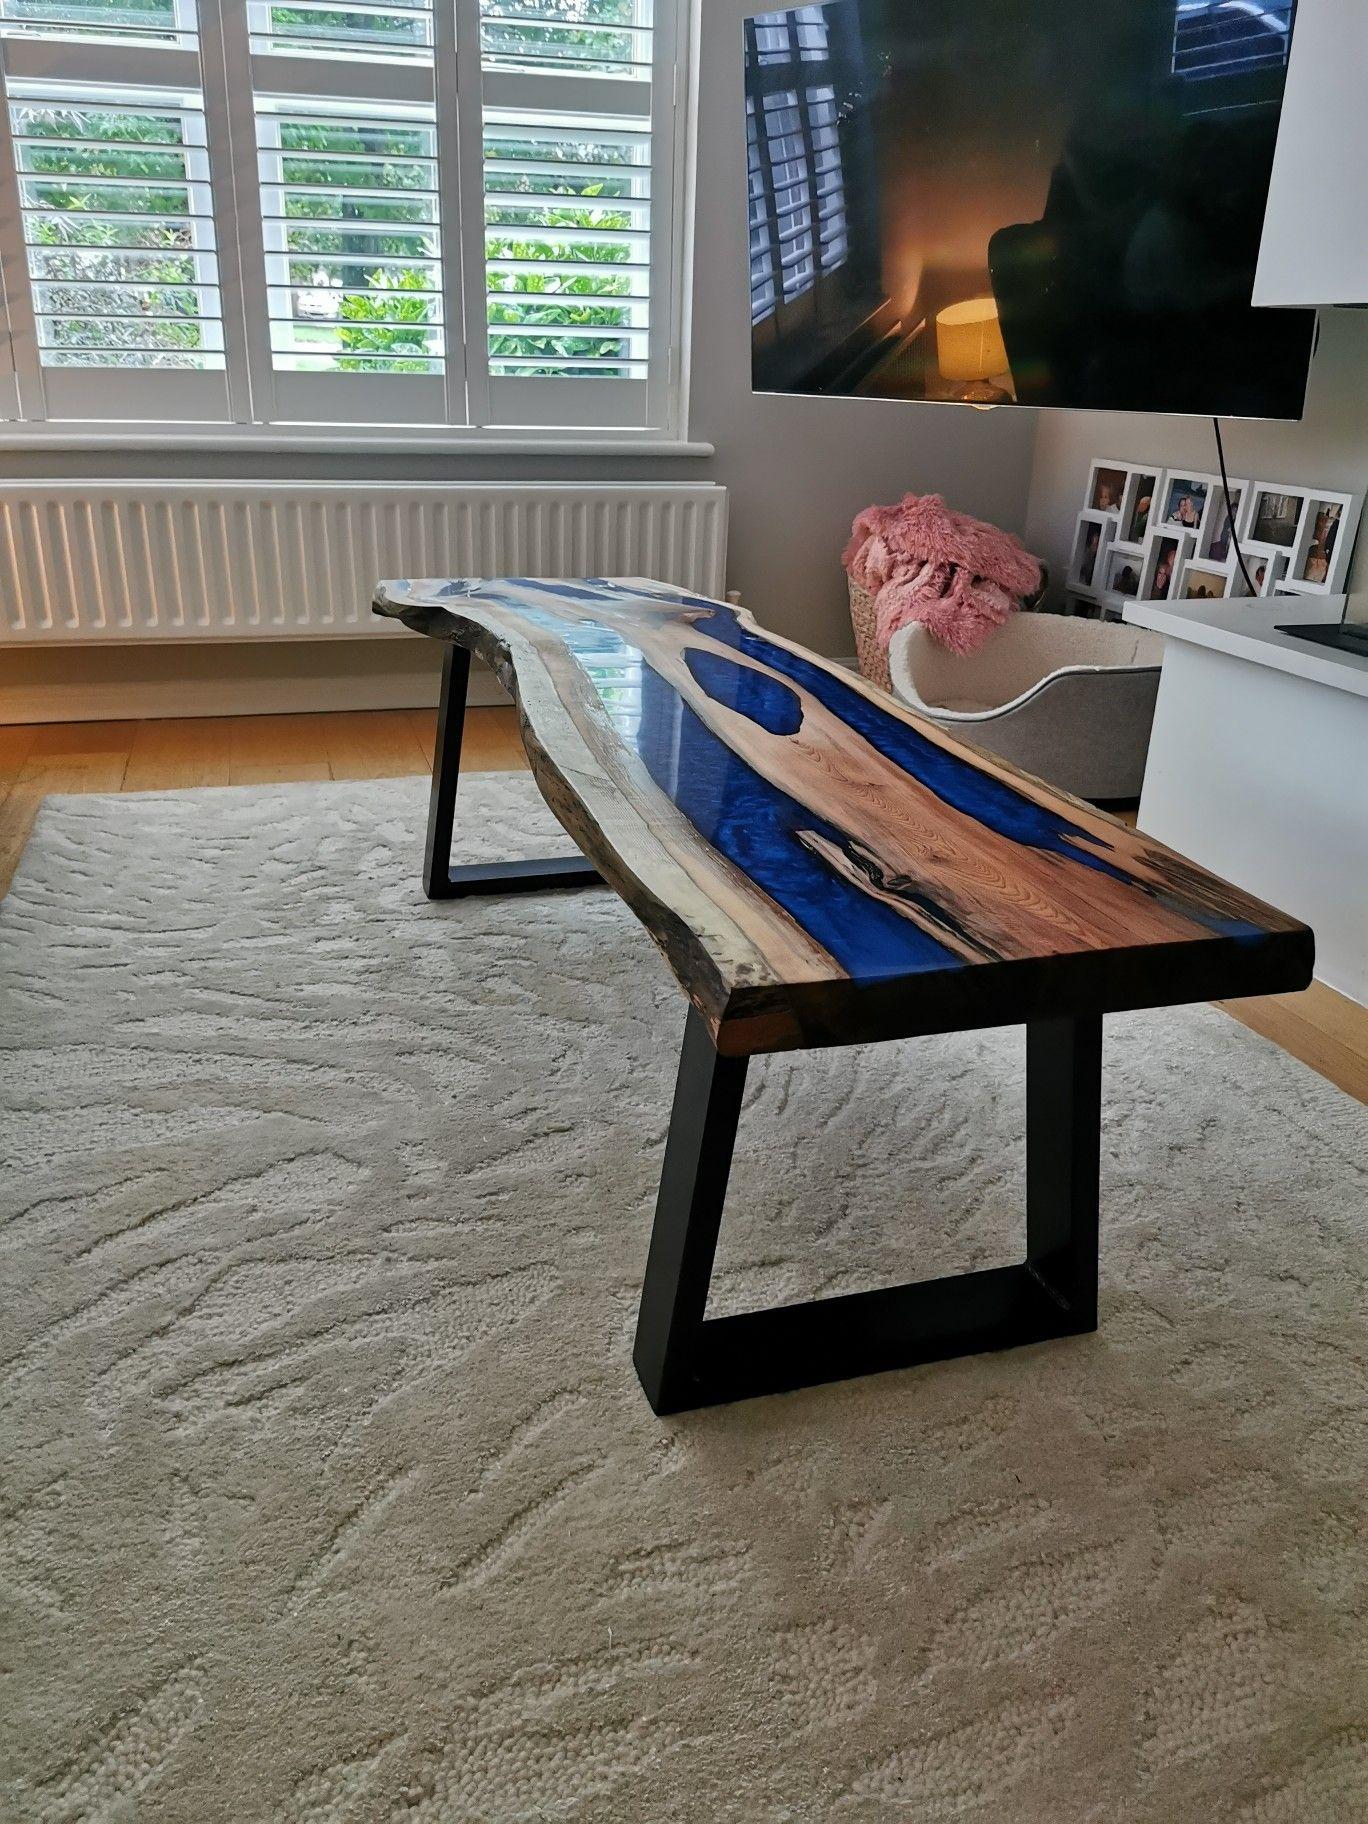 Resin Table By Uk Craftsman Dan At Cedars Yard Yew And Metallic River Effect Table Rustic Furniture Furniture Live Edge Rustic [ 1824 x 1368 Pixel ]